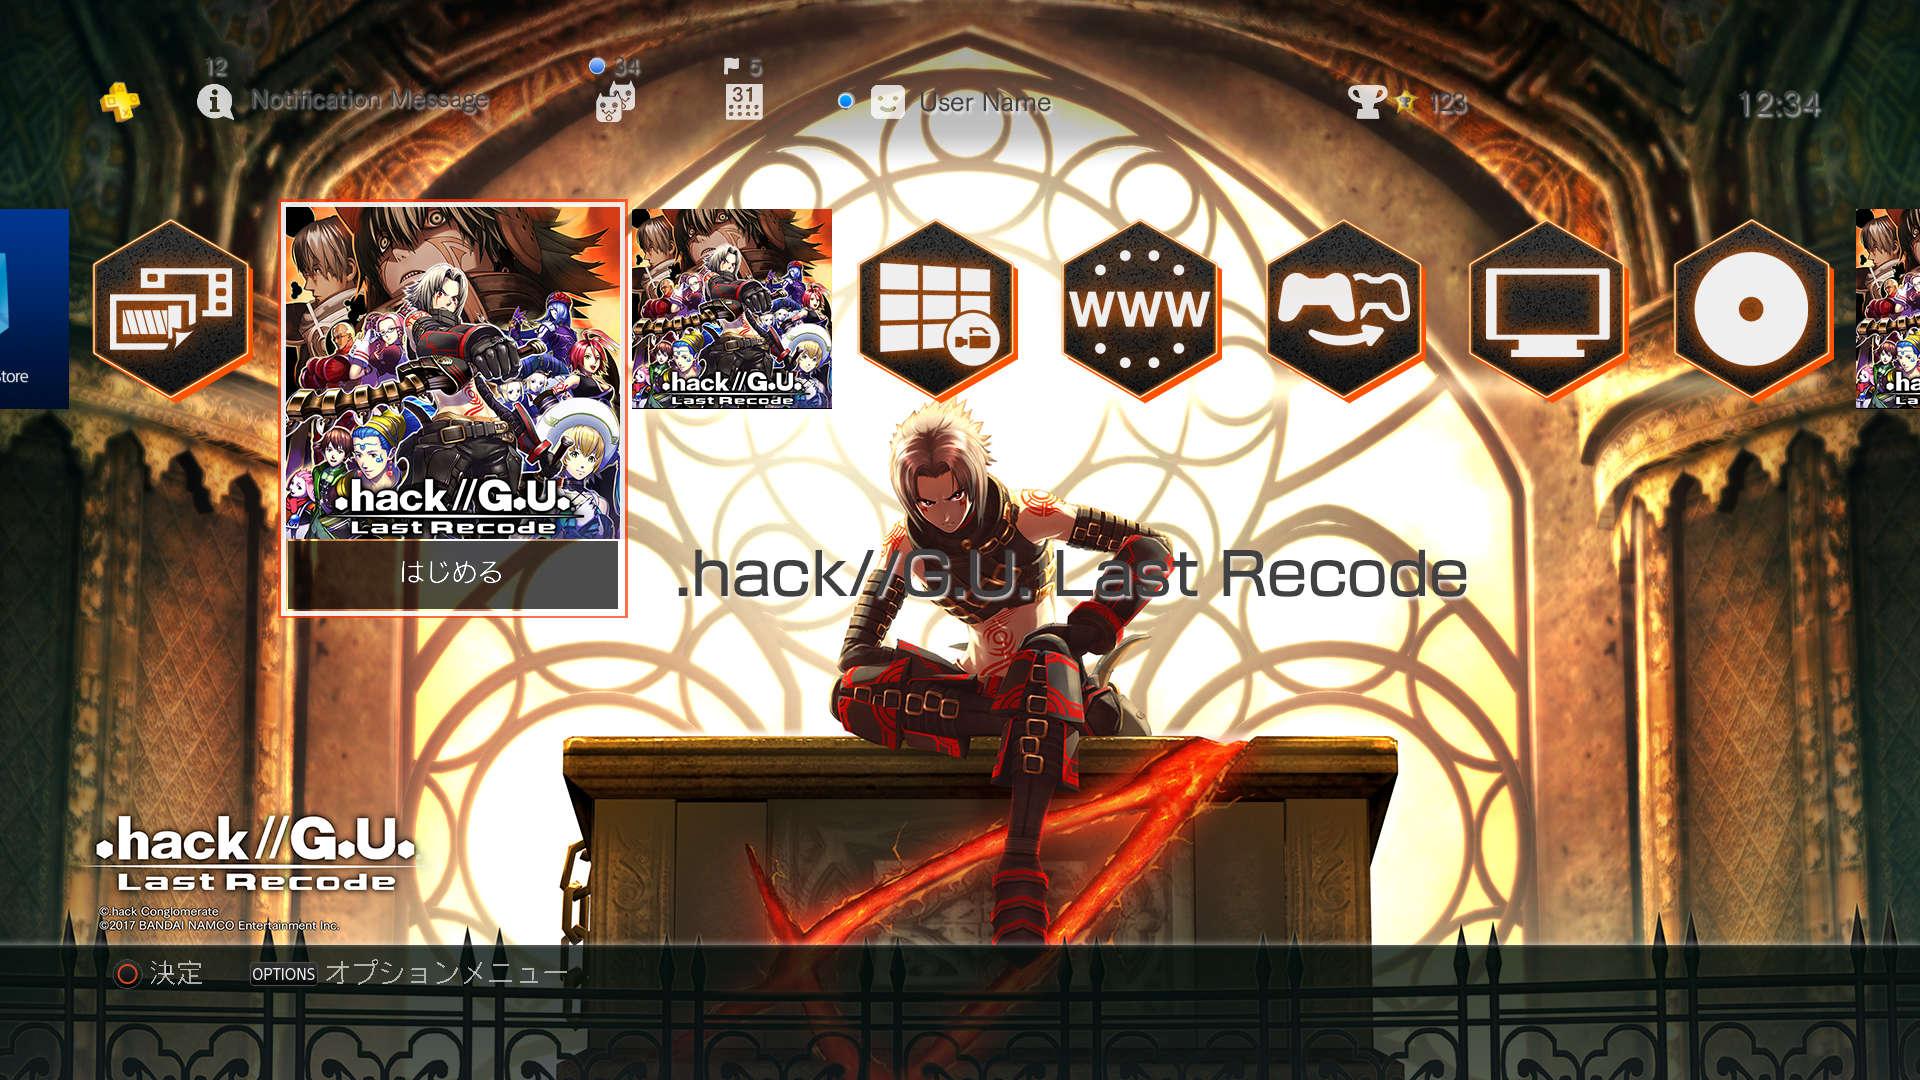 Hack G U Last Recode Will Have New Episode Vol 4 Neogaf